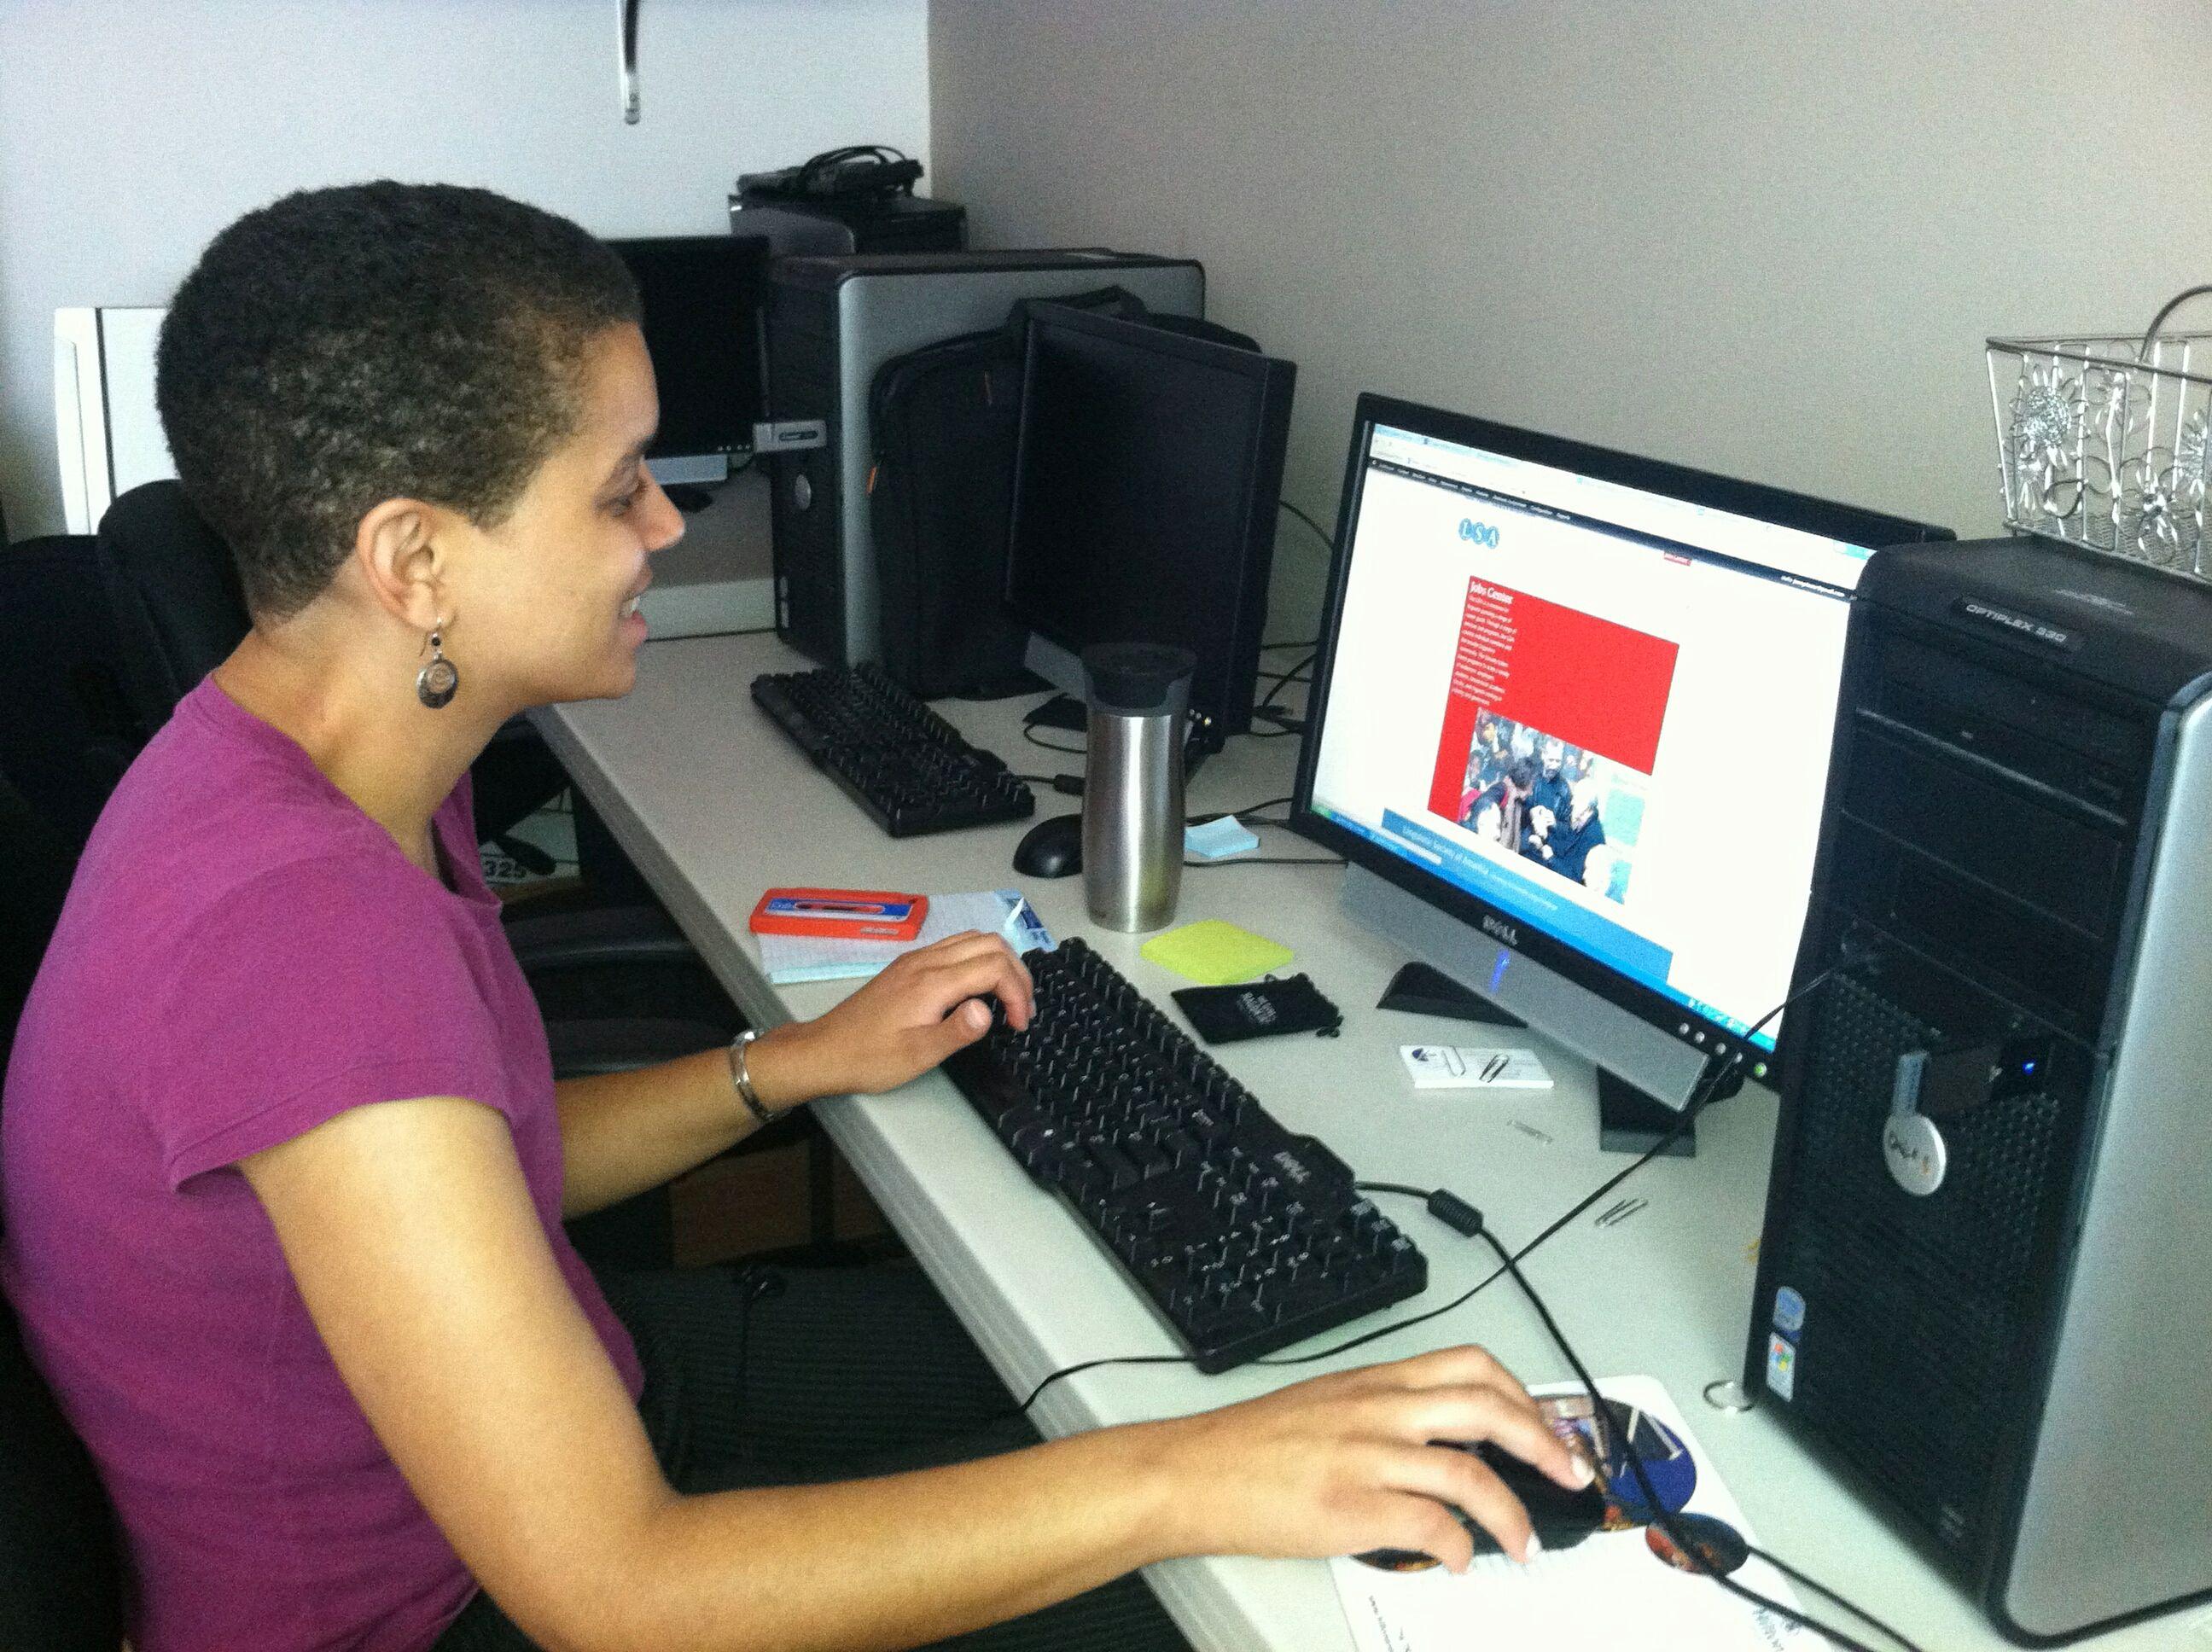 NIH Invites Linguists to Contribute Major Accomplishments